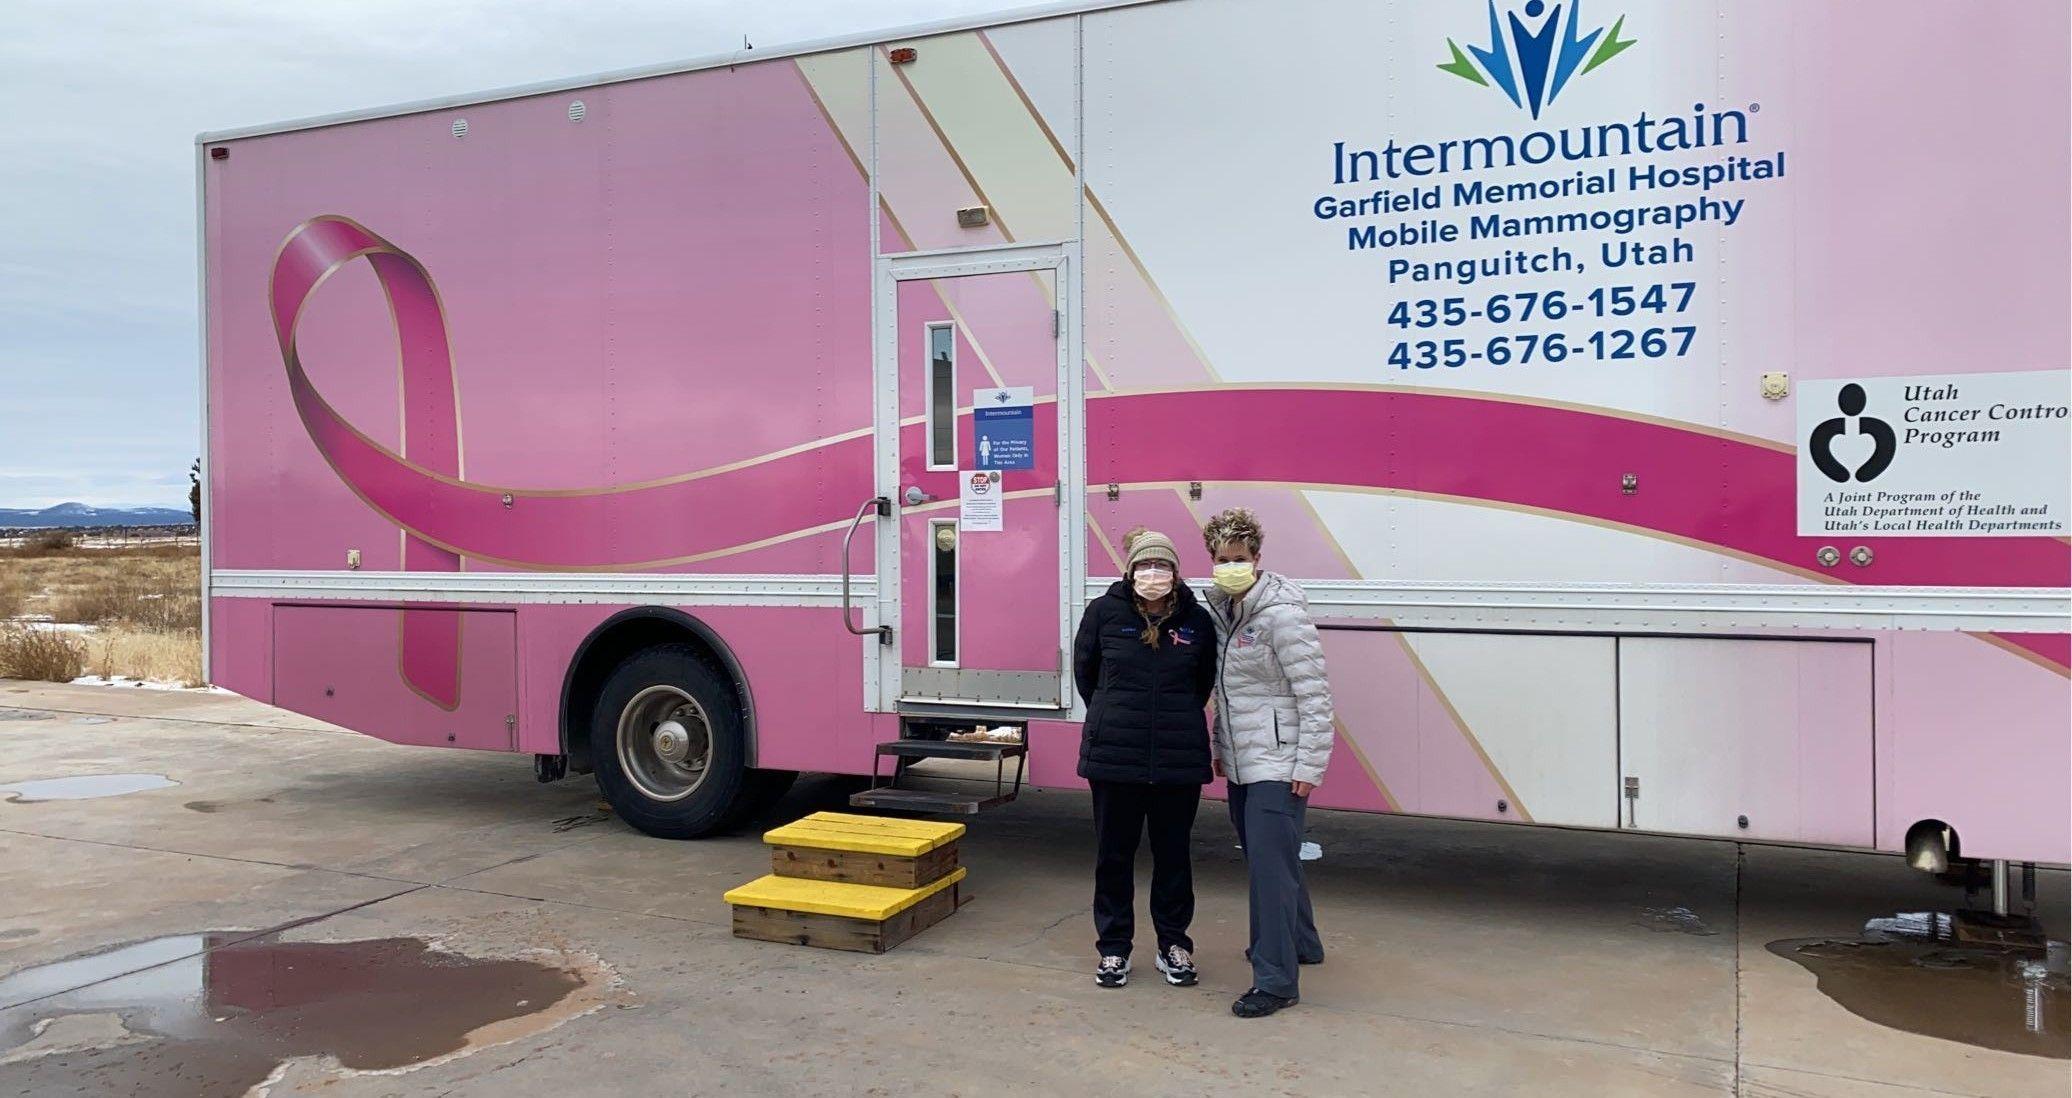 2021 Intermountain / Creek Valley Mammogram Bus